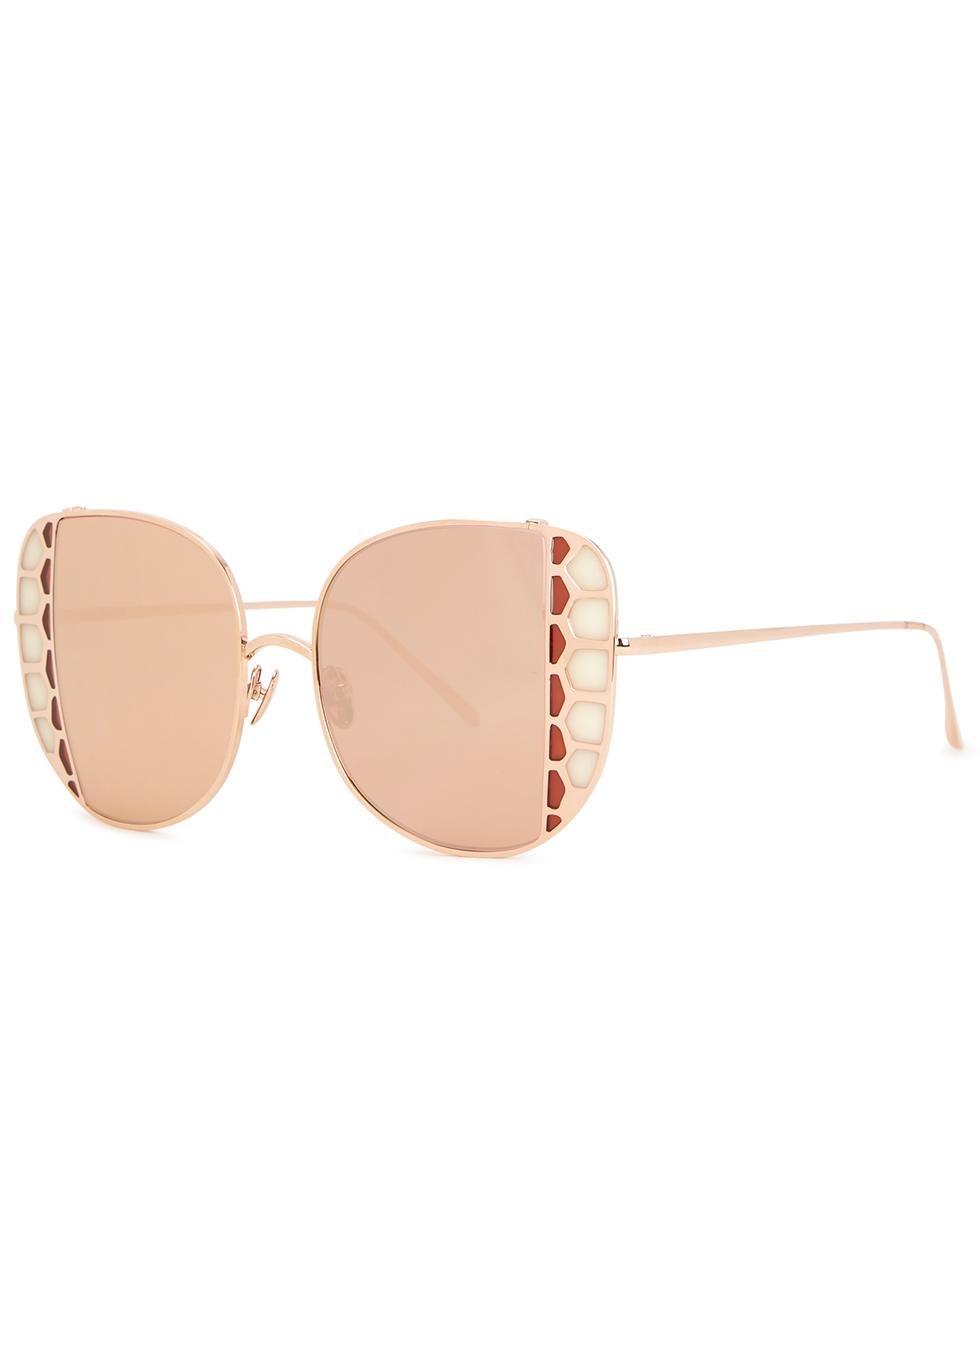 Amelia mirrored oversized sunglasses